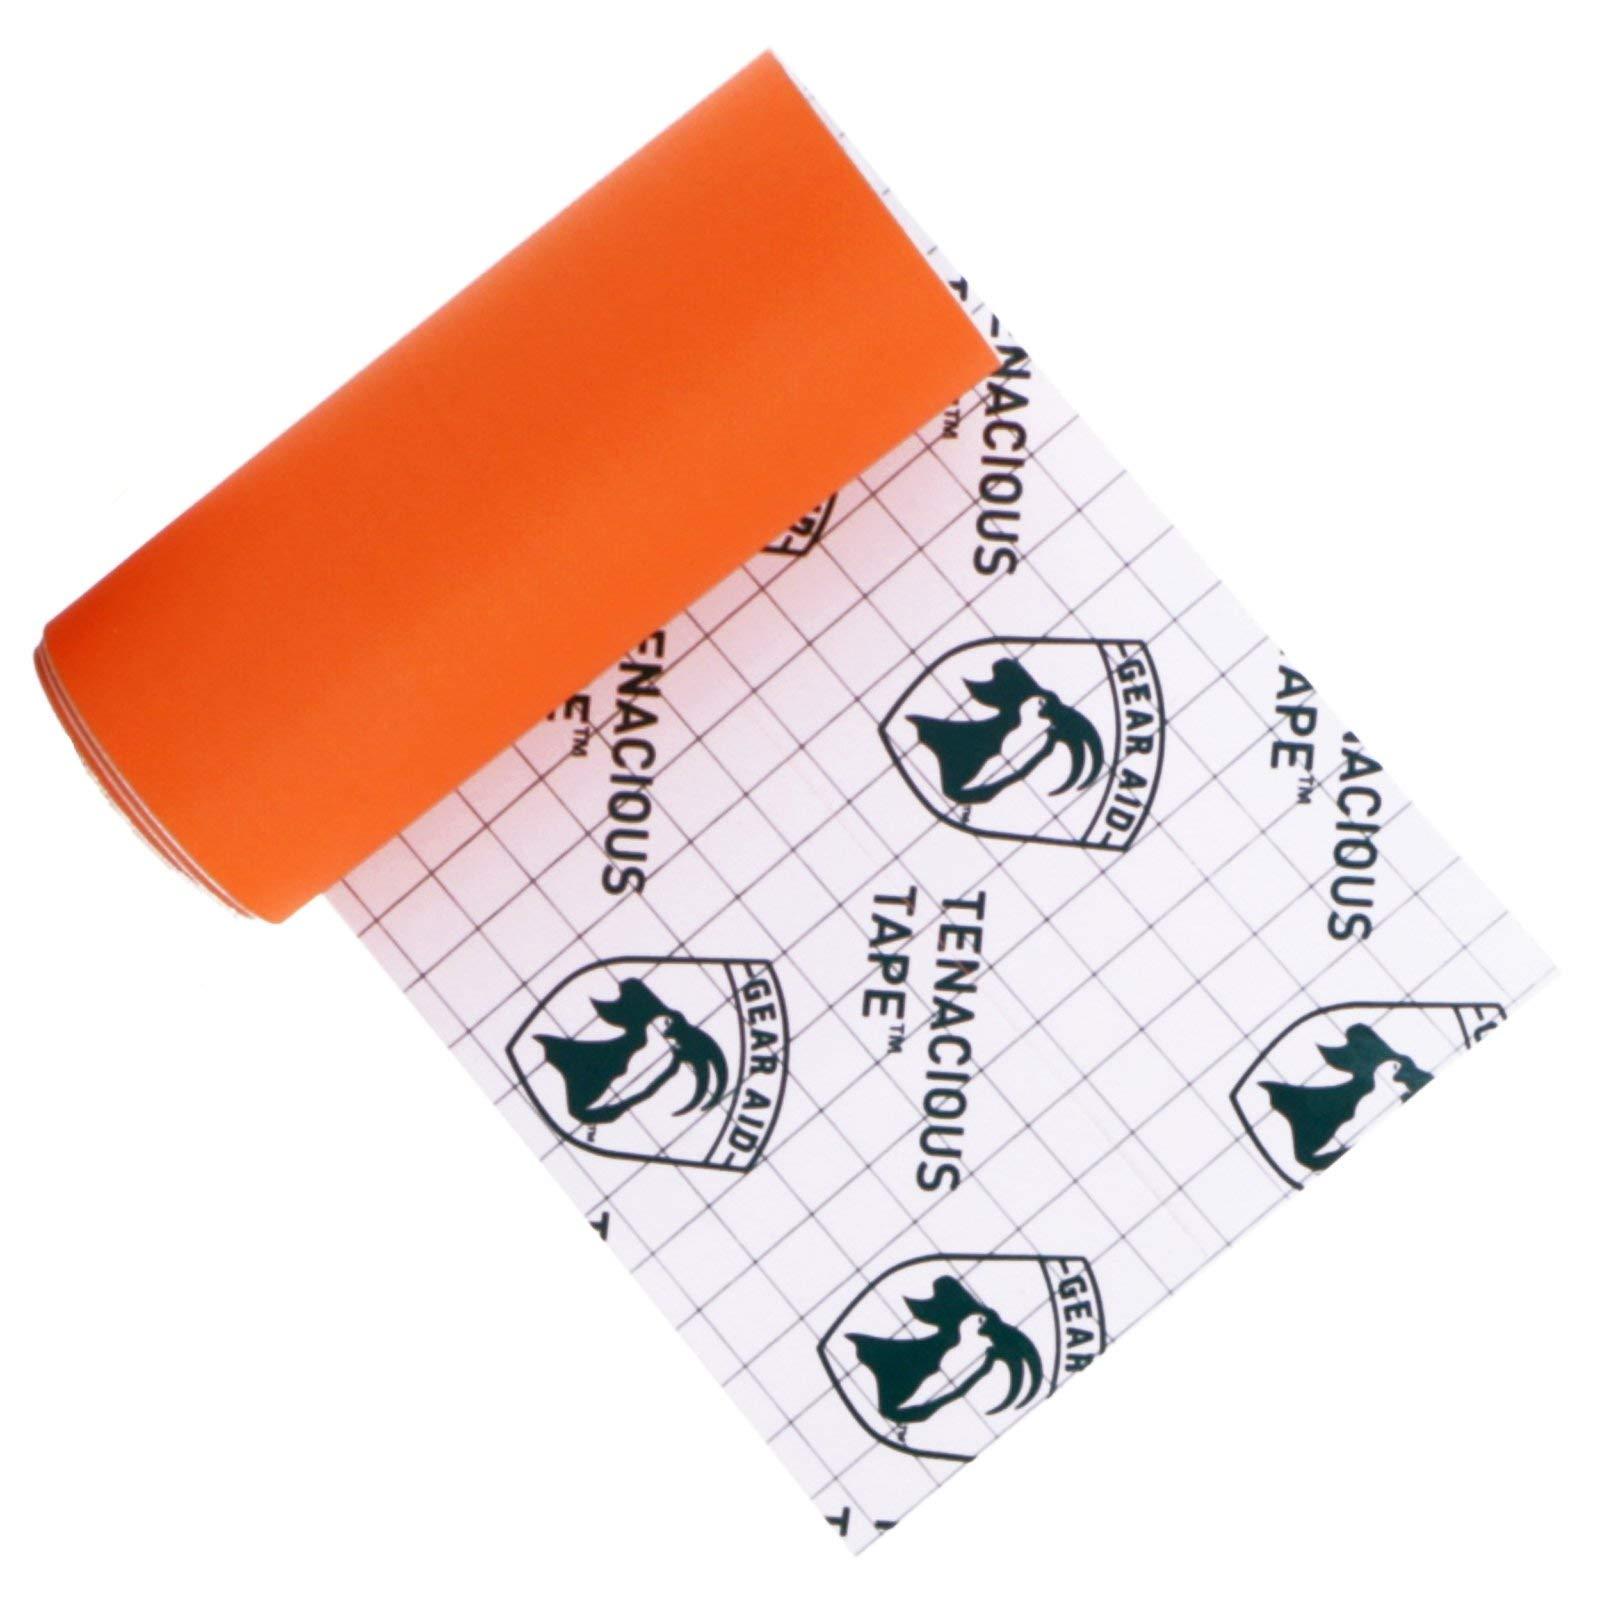 "Gear Aid Tenacious Tape Nylon Repair Tape for Fabric and Vinyl, 3"" x 20"", (Orange) by Gear Aid (Image #4)"